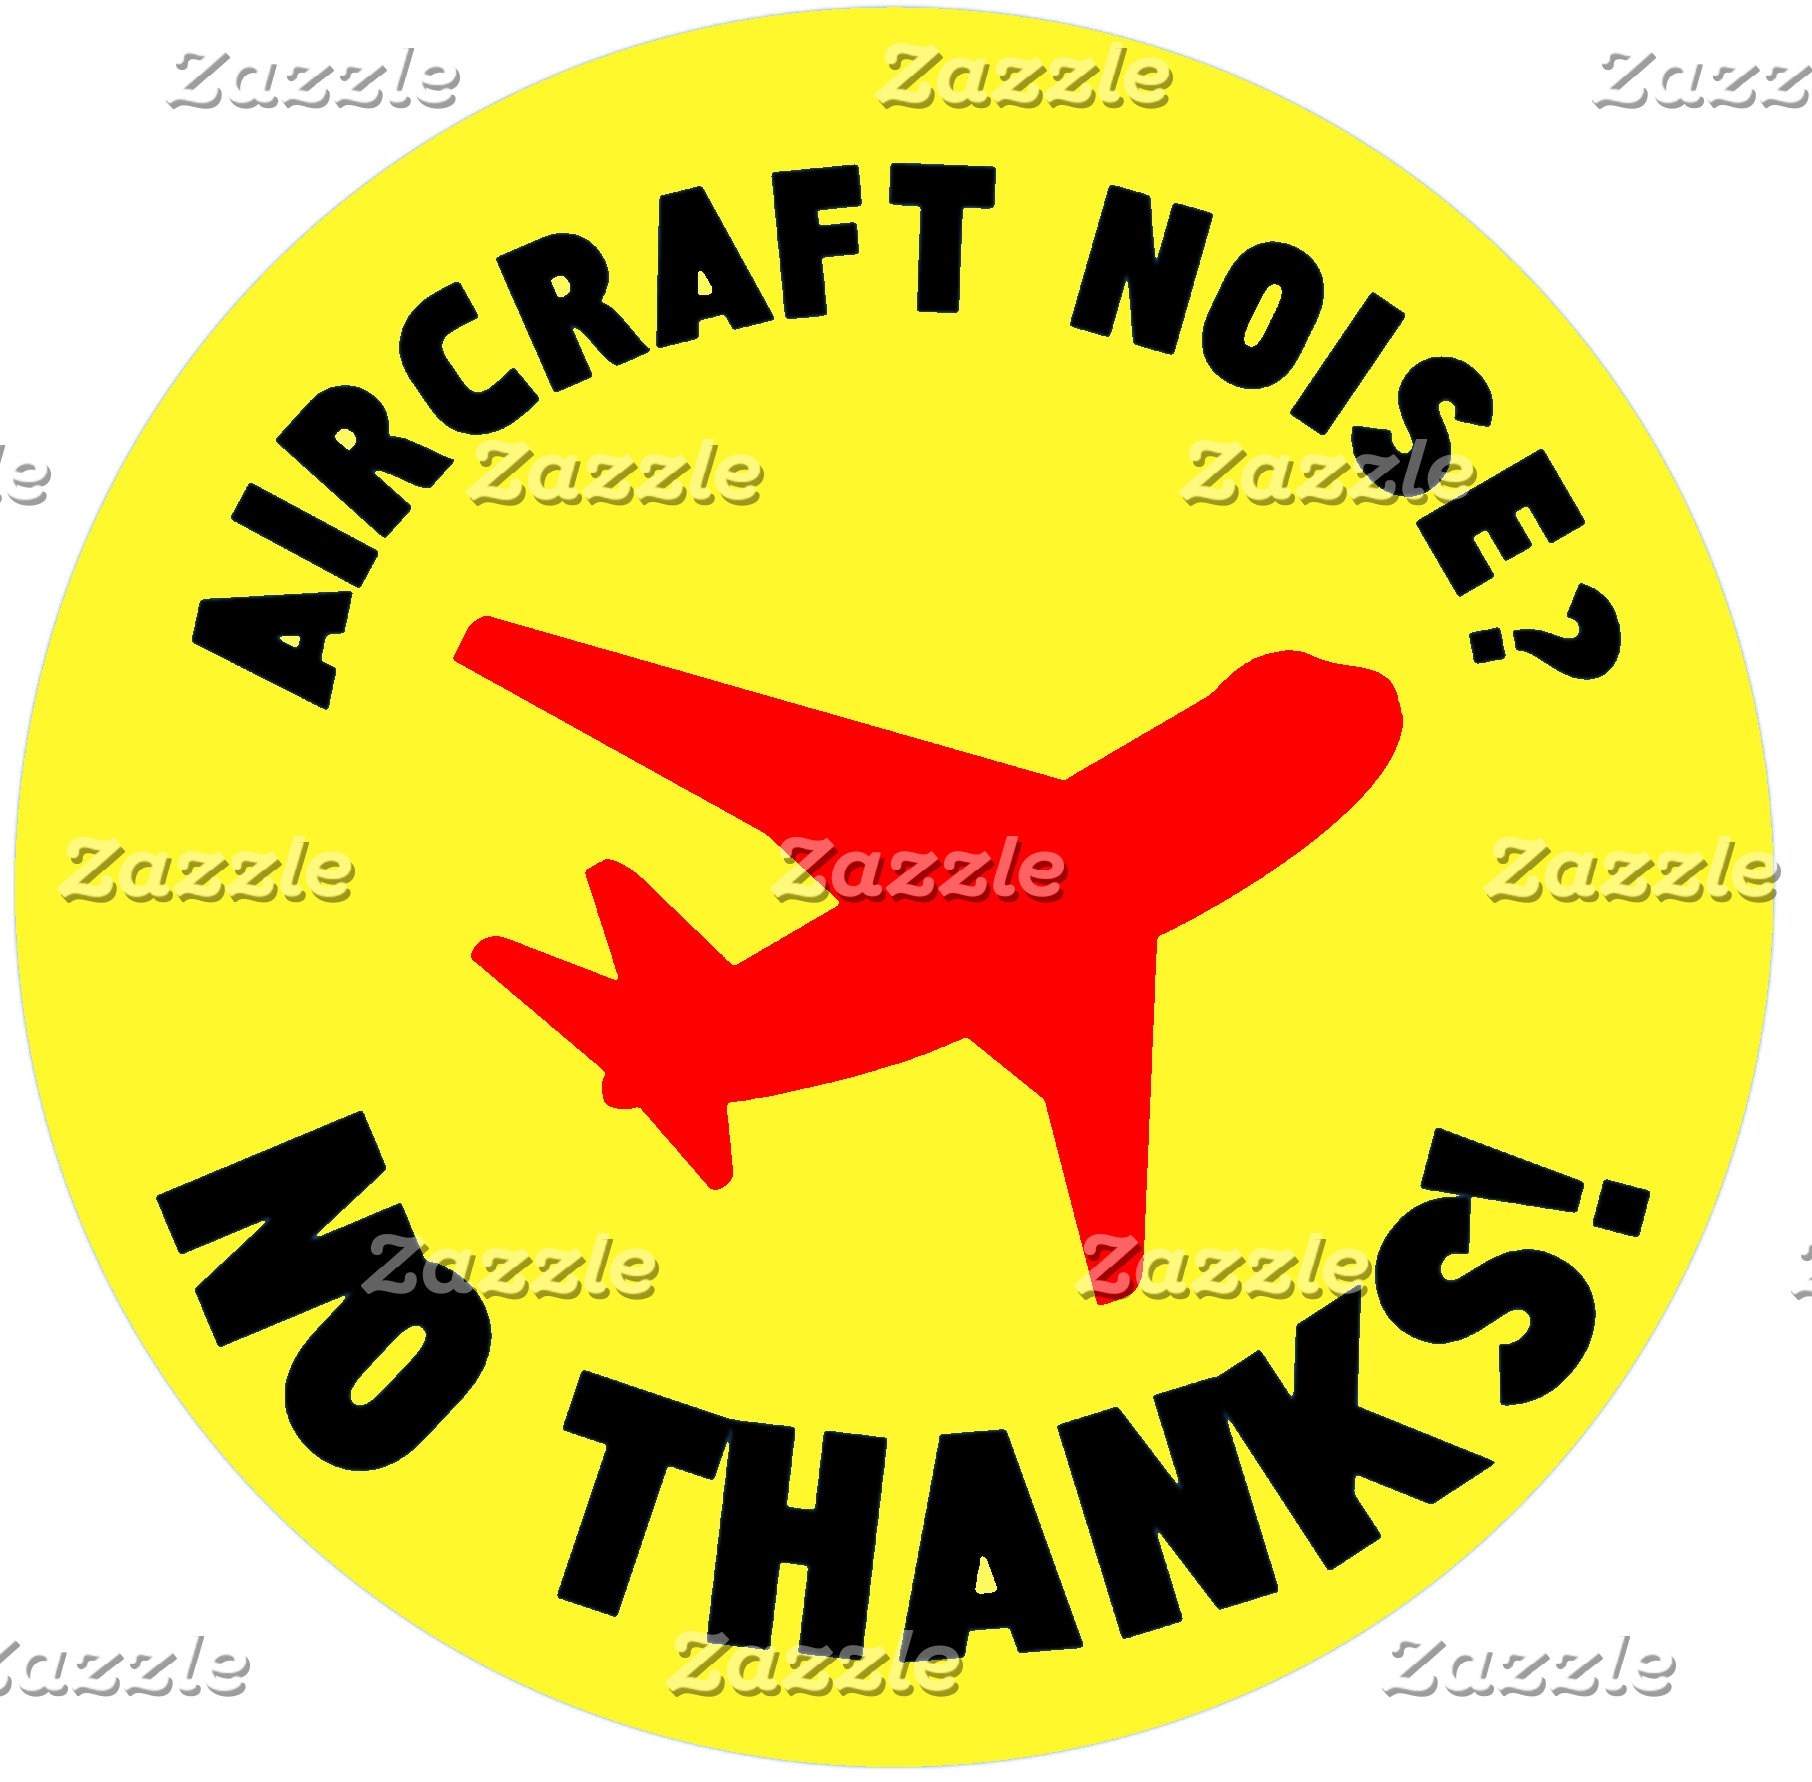 Aircraft noise? No thanks!